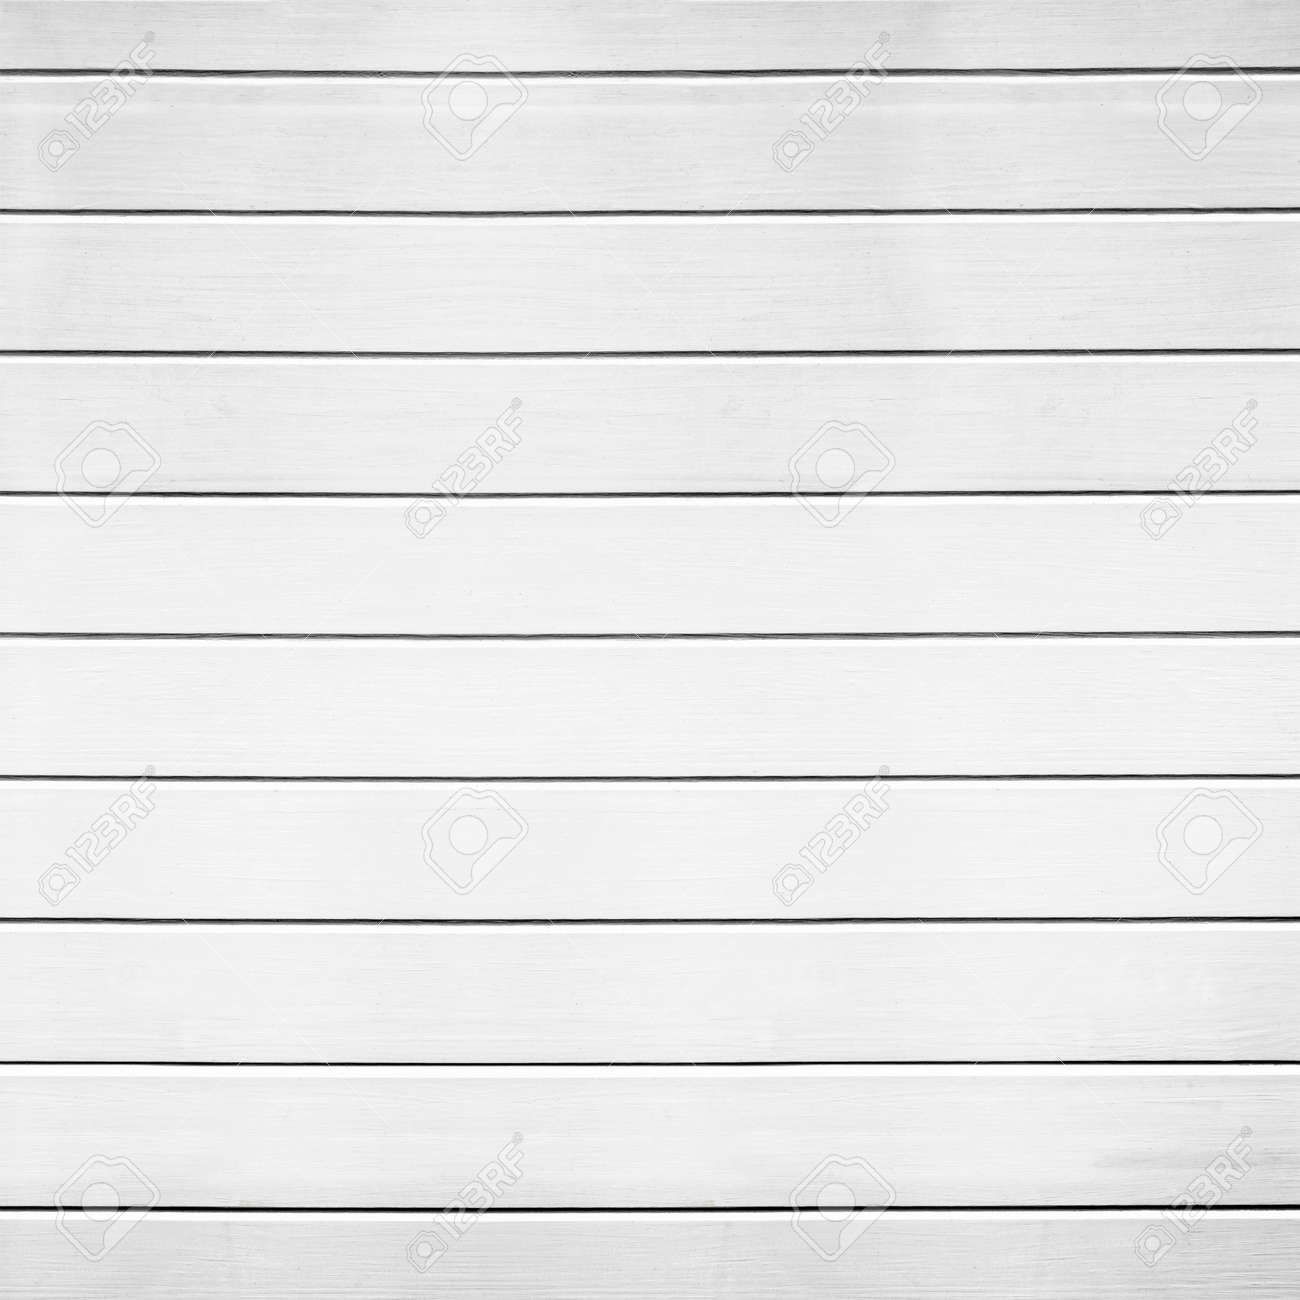 White Wood Paneling WB Designs - White Wood Paneling WB Designs